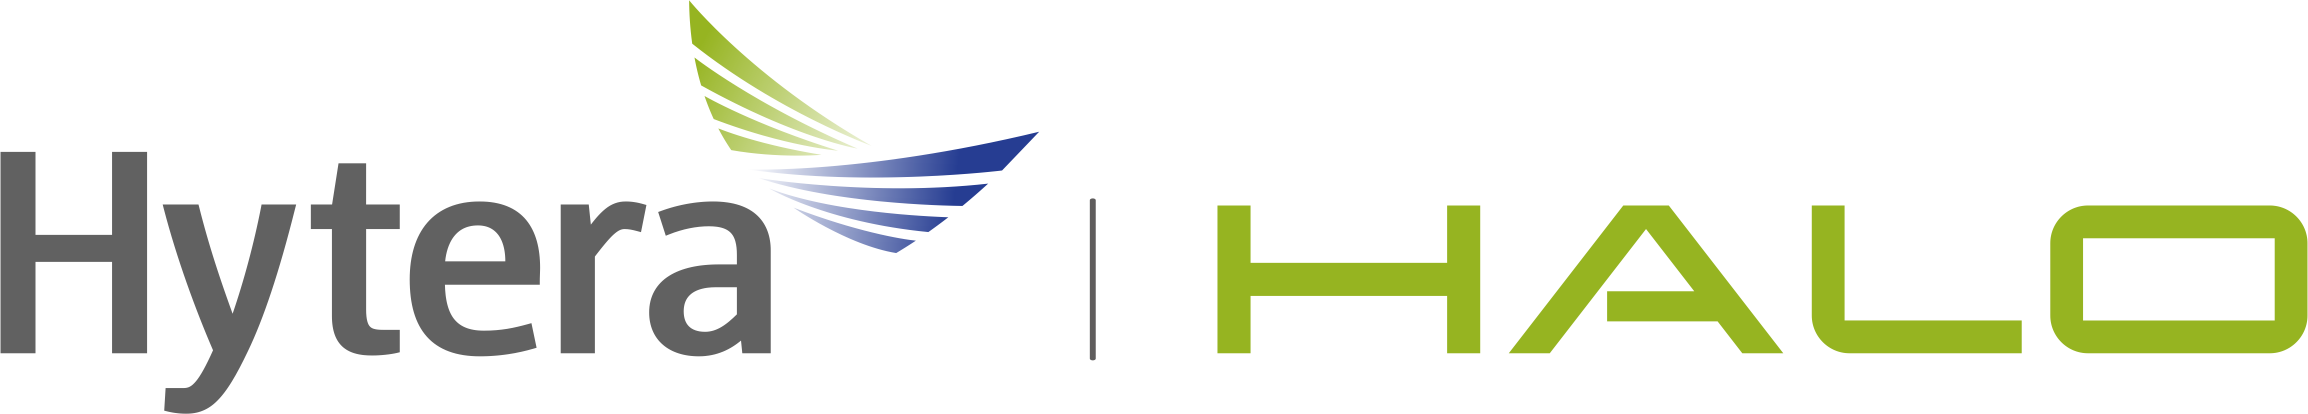 hytera-halo-image.png